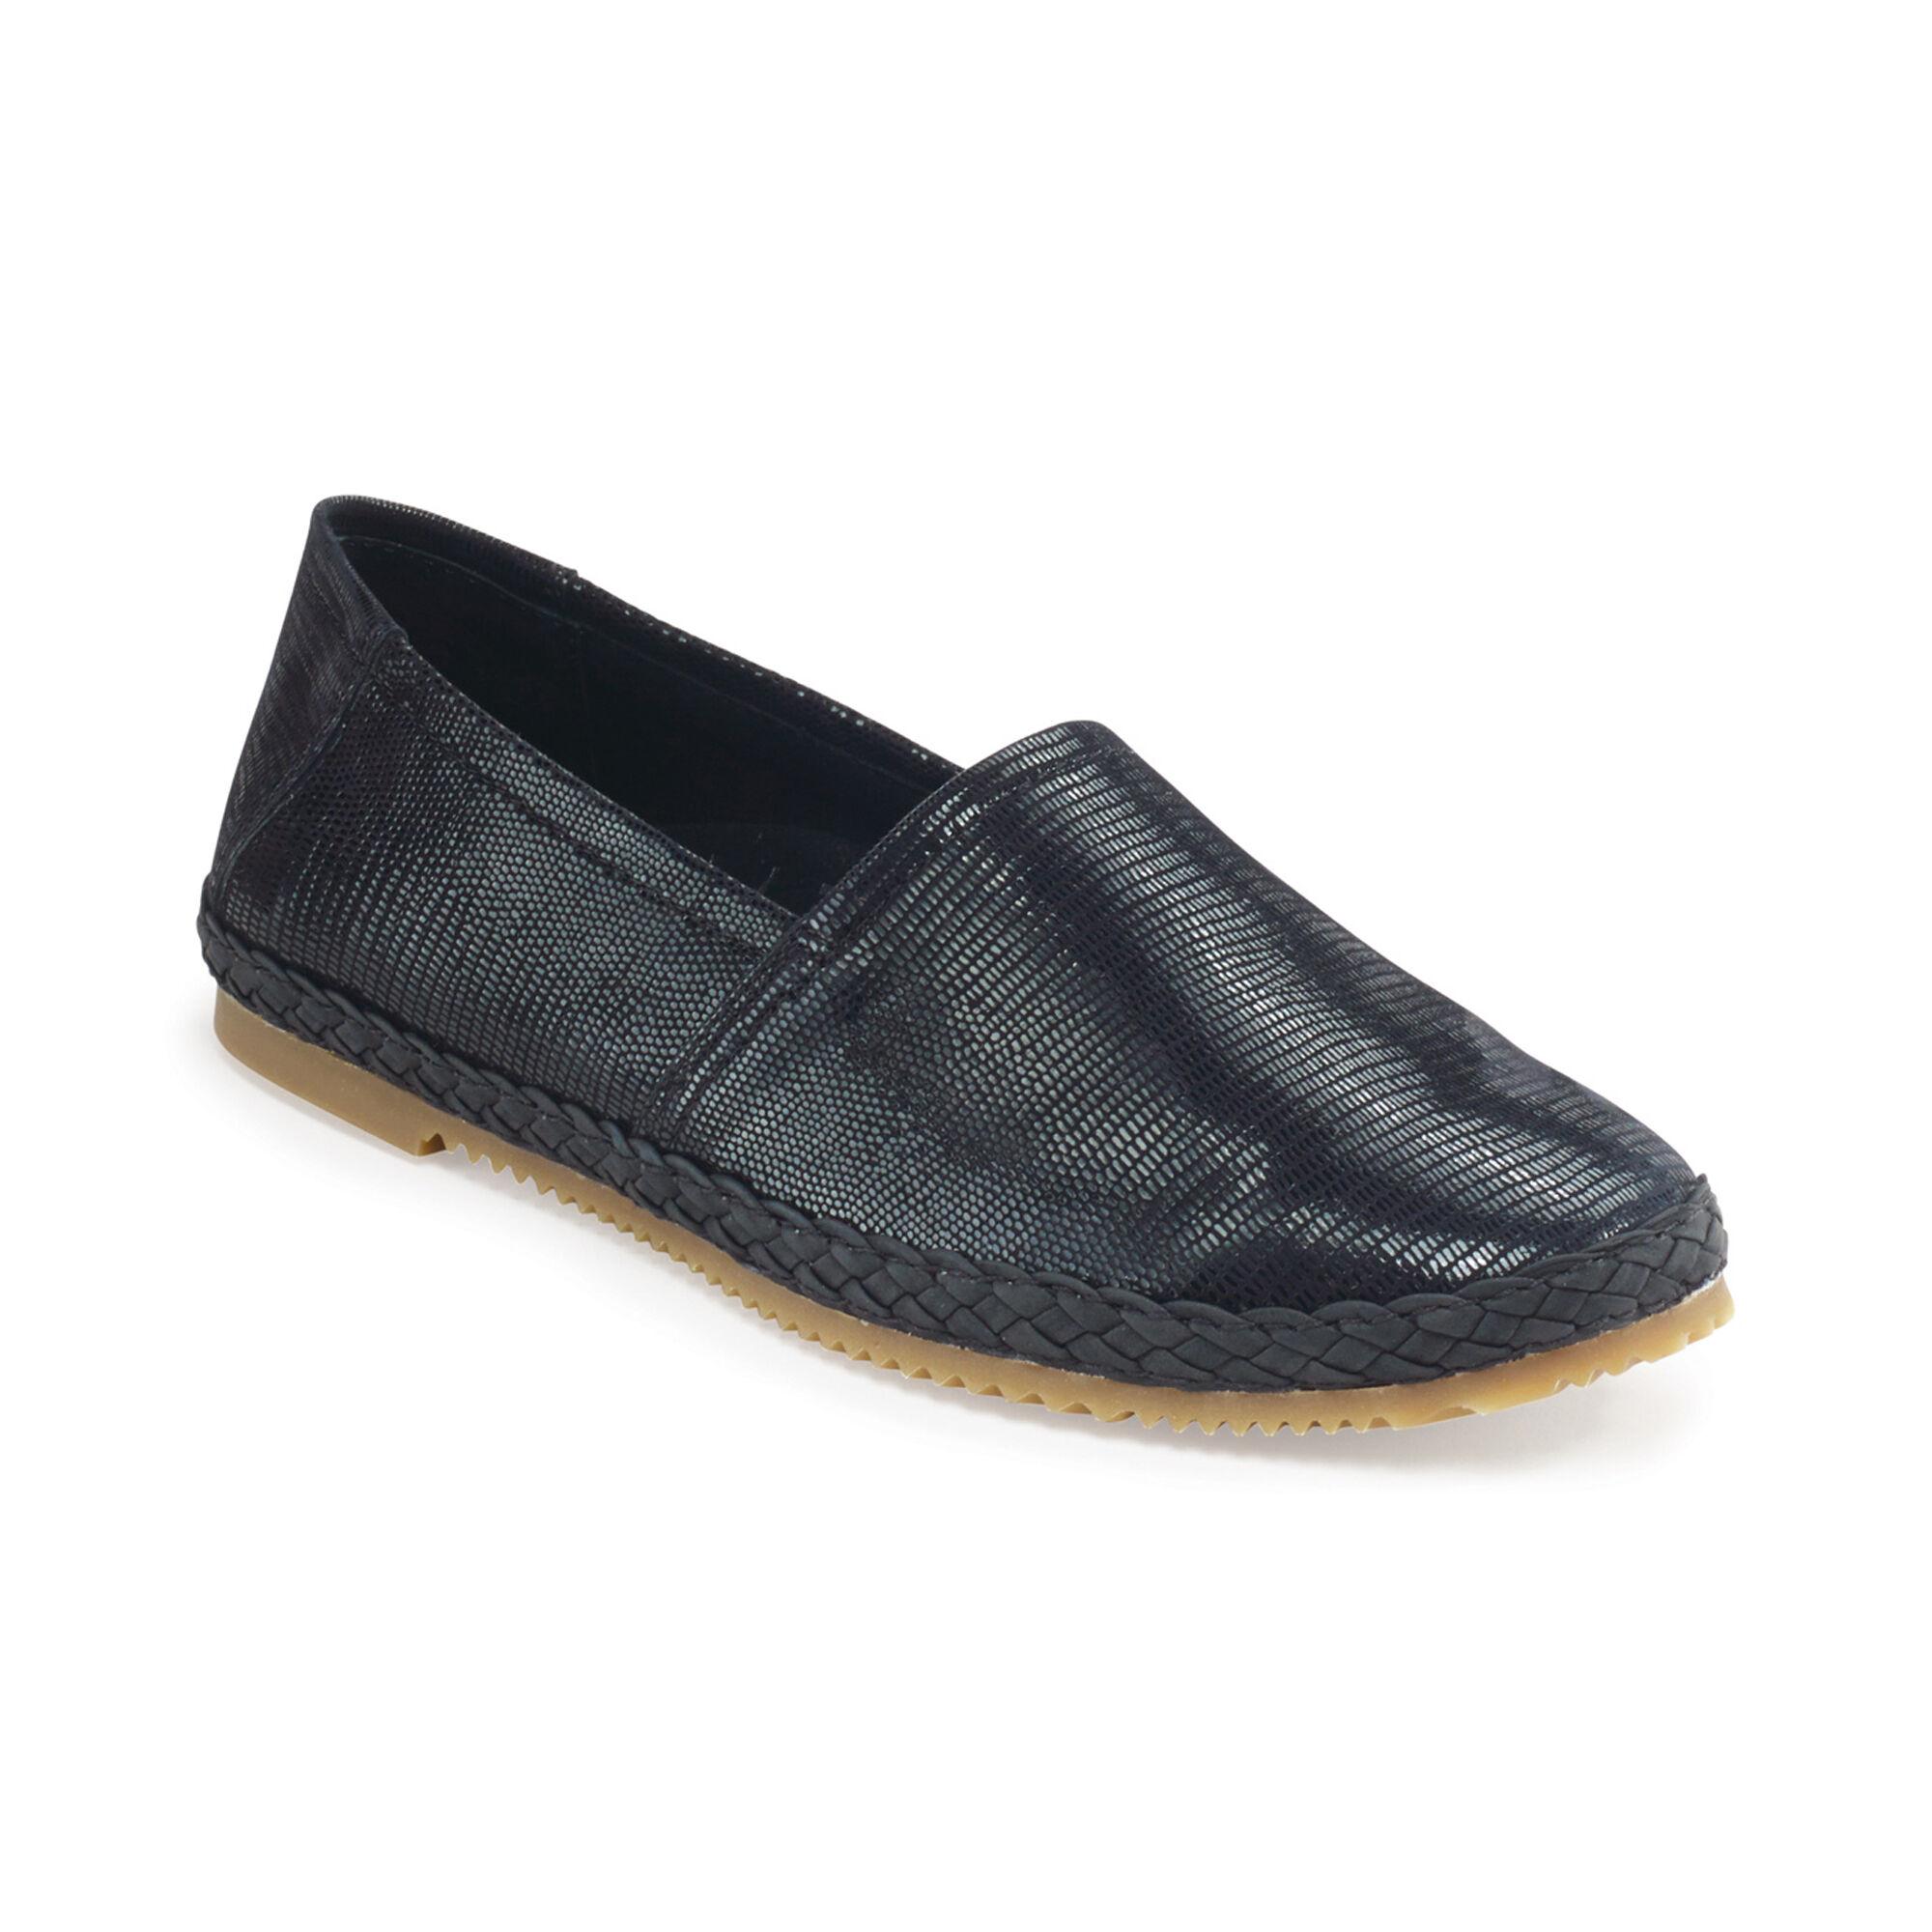 Aetrex Shoes on Sale   Aetrex